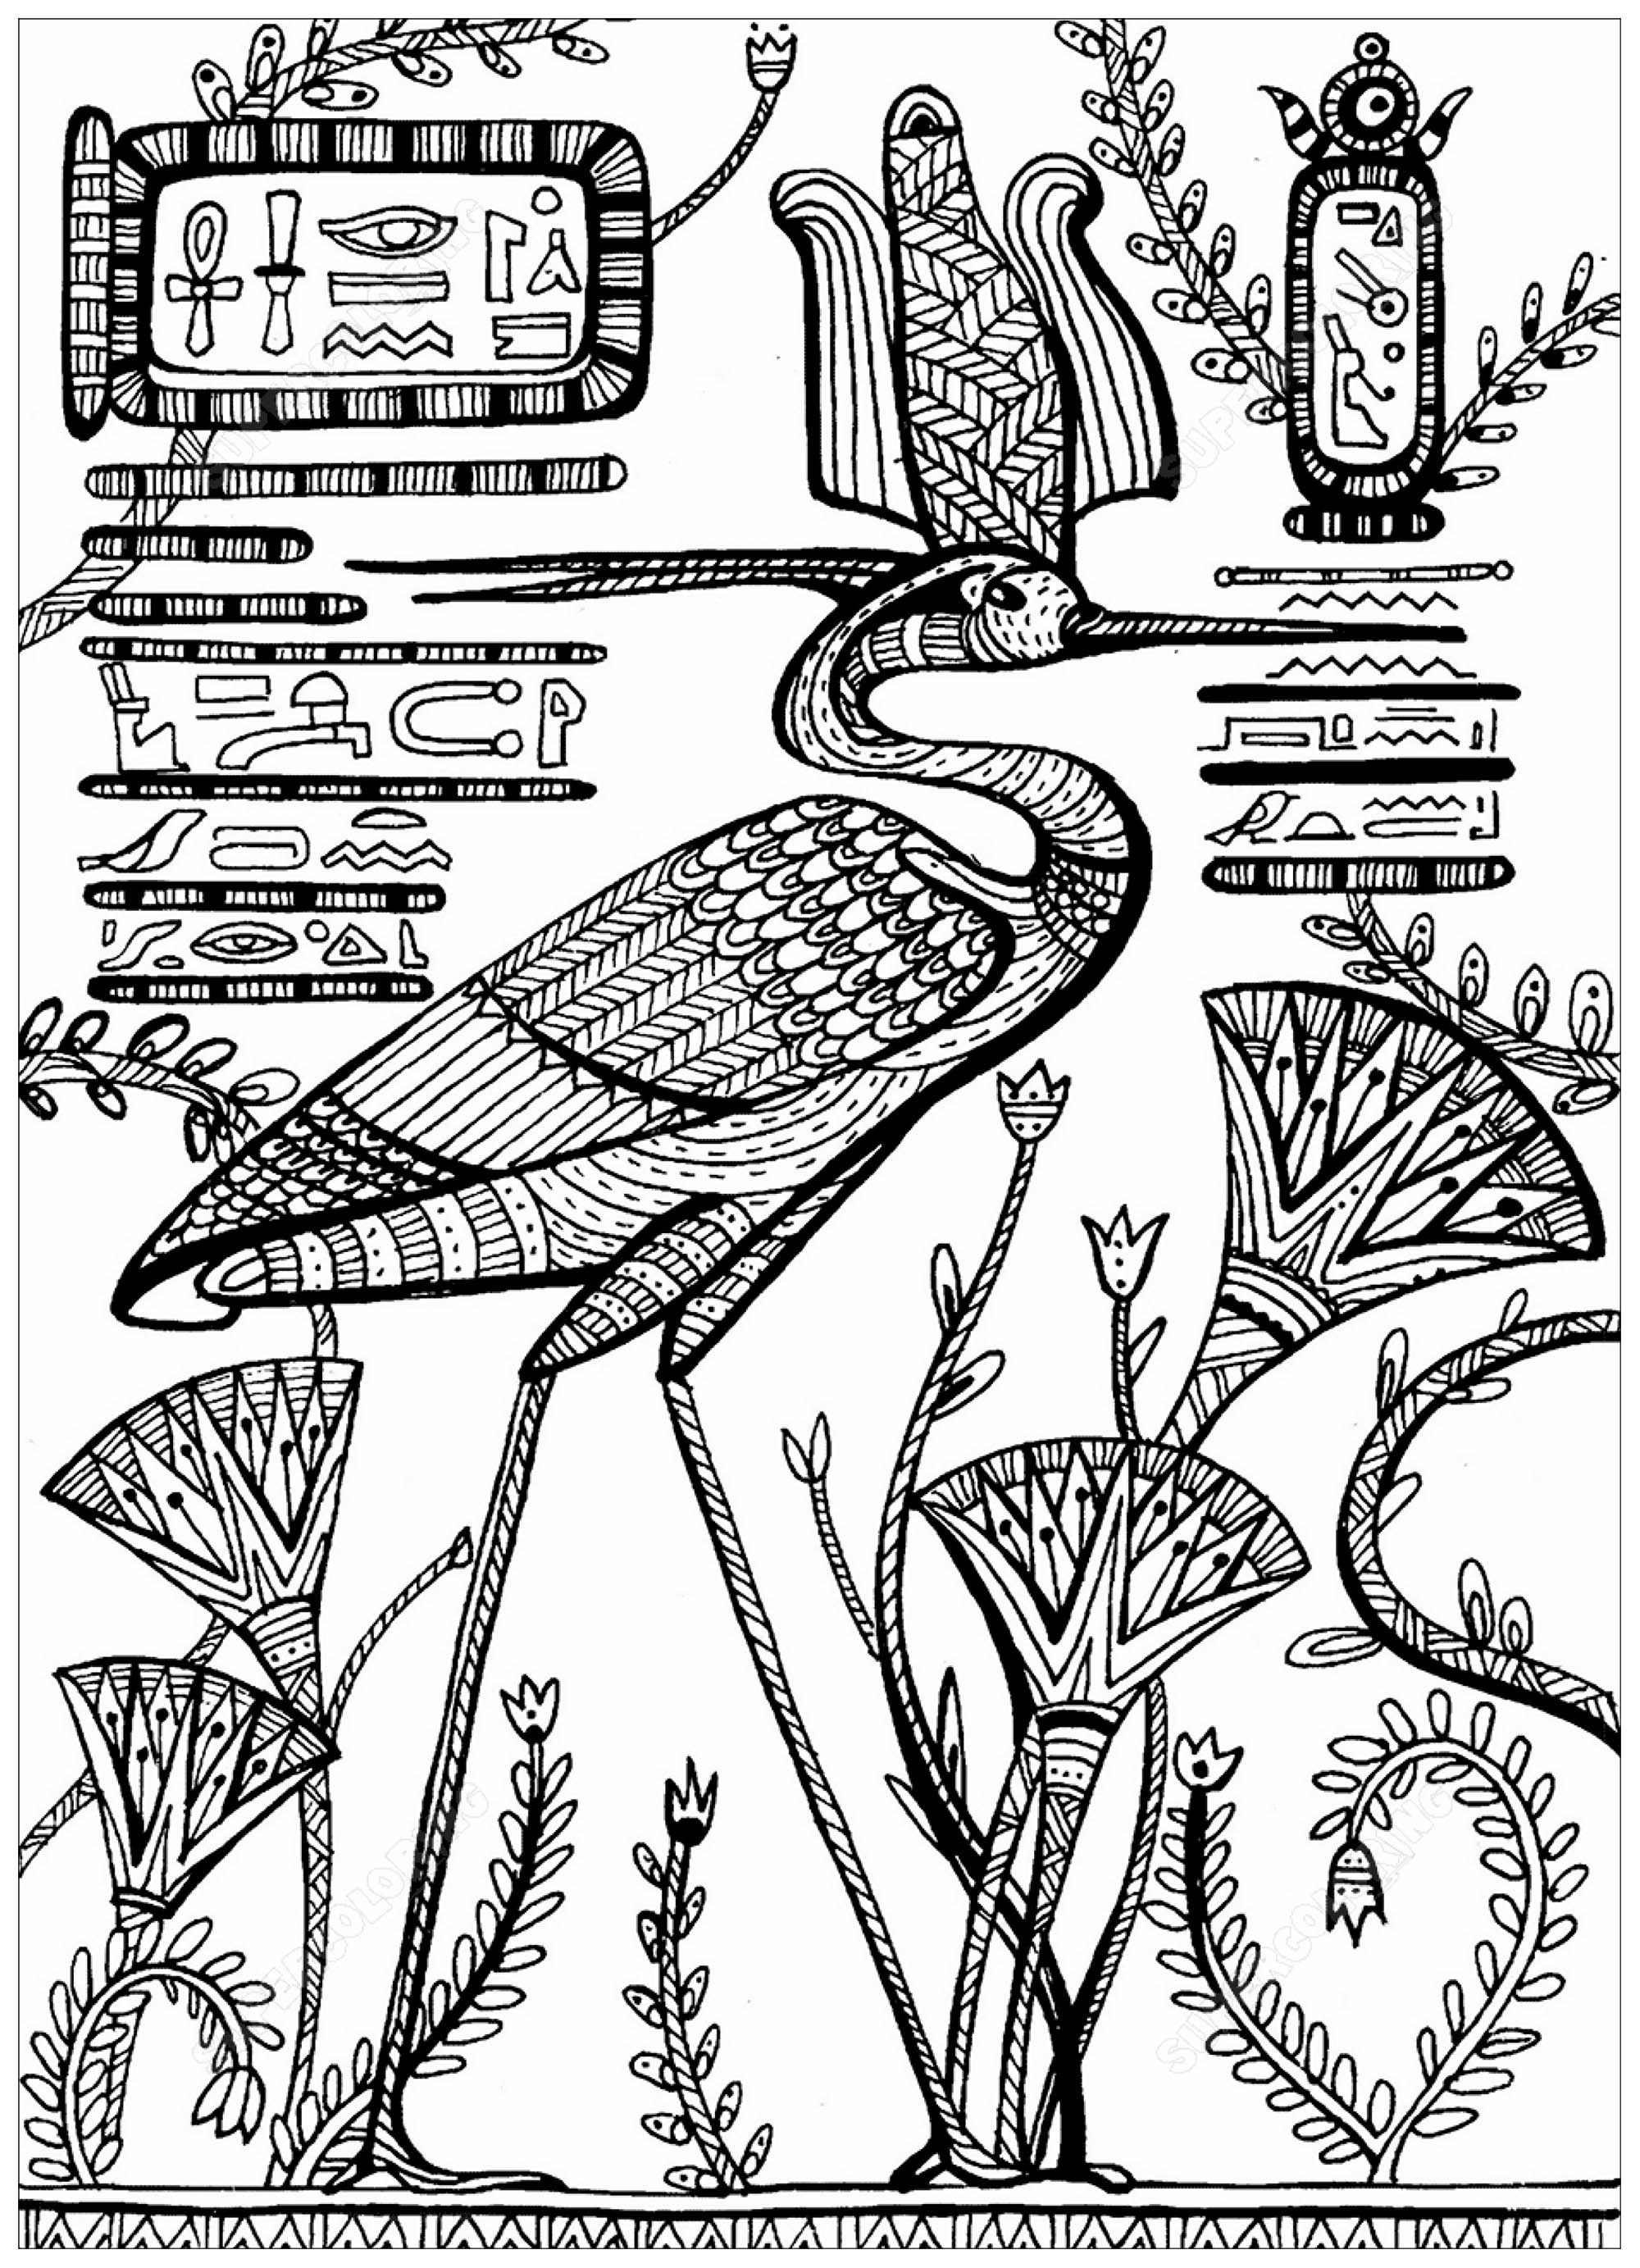 Coloriage A Imprimer Egypte Antique.Bennu Dieu Egypte Ancienne Represente Egypte Coloriages